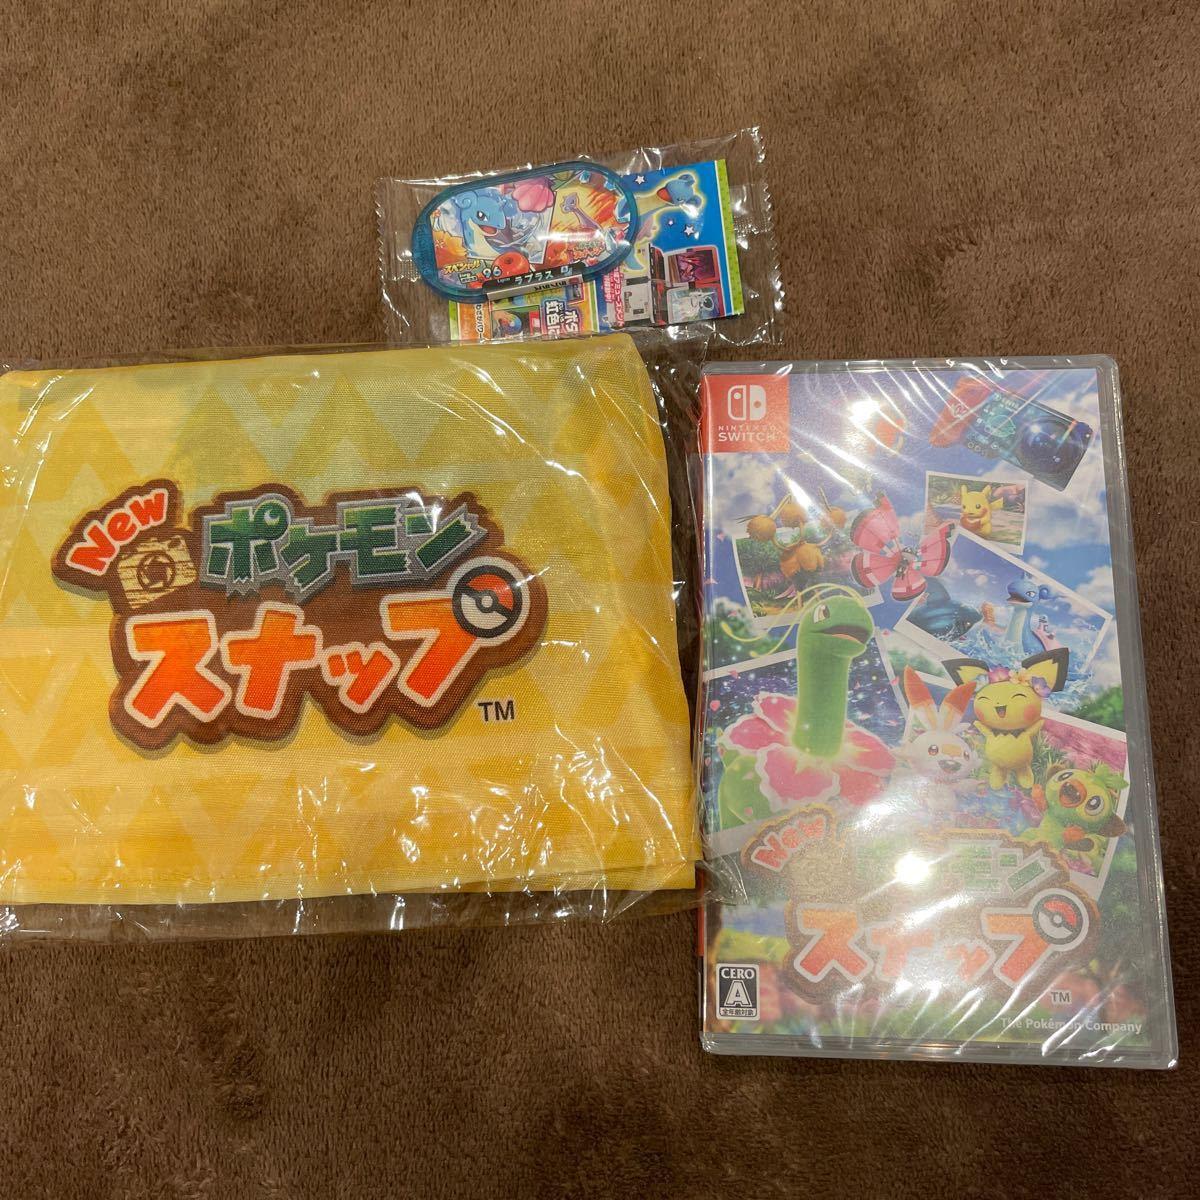 【Switch】 New ポケモンスナップ Nintendo Switch 任天堂スイッチ